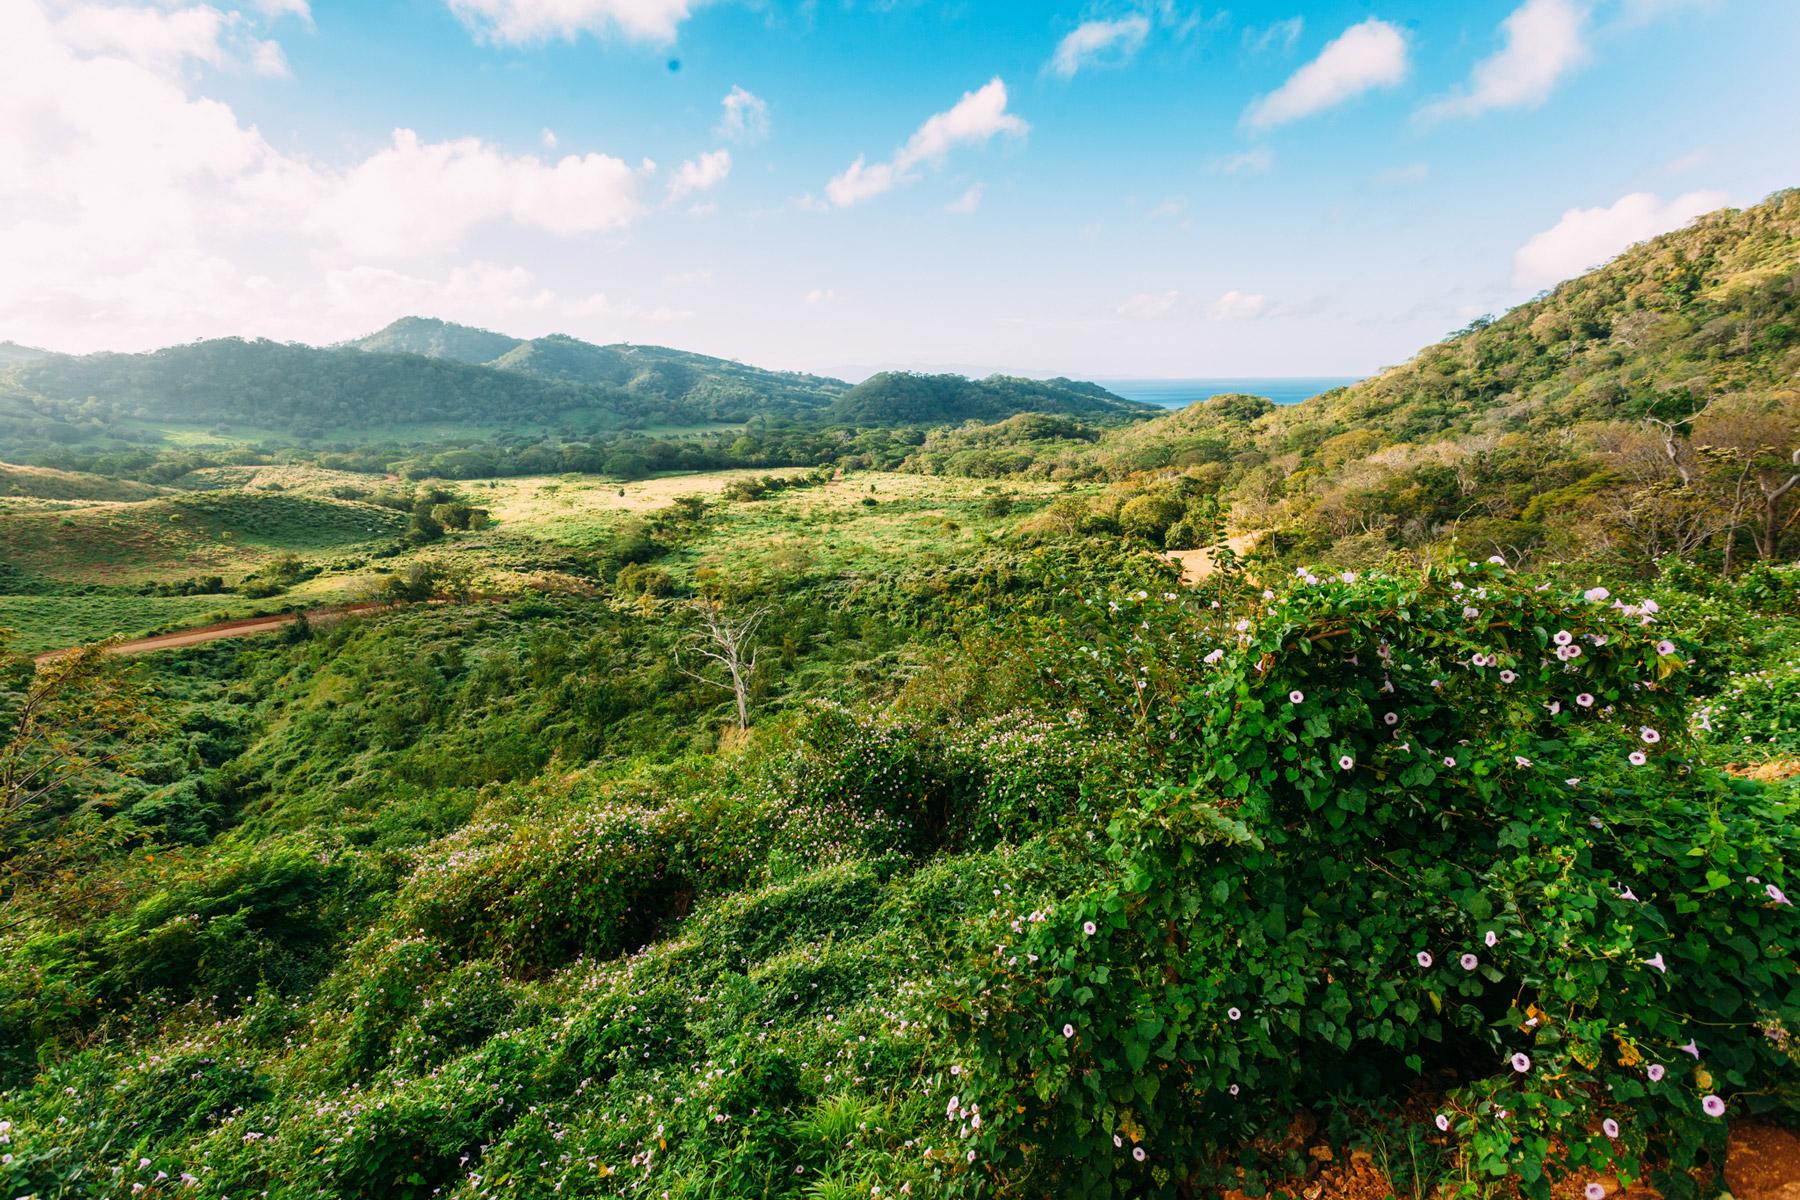 Terreno por un Venta en Big Sky Ranch Nicaragua - Signature Home Sites San Juan Del Sur, Rivas, Nicaragua